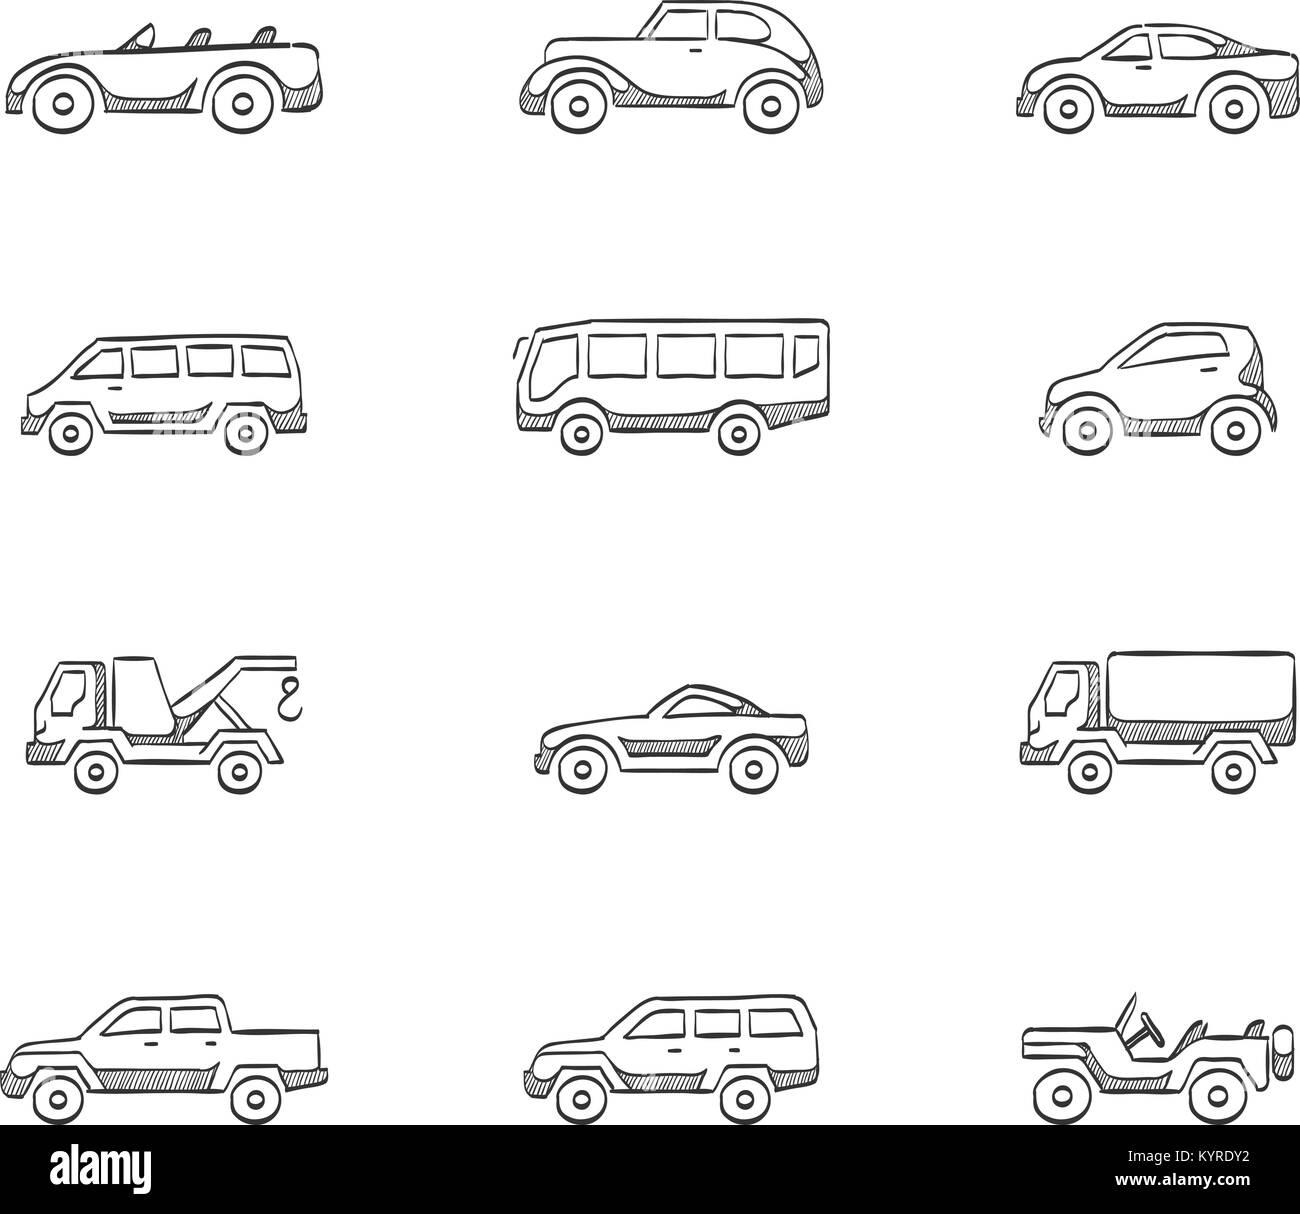 Auto Icons in der Skizze Vektor Abbildung - Bild: 172004870 - Alamy